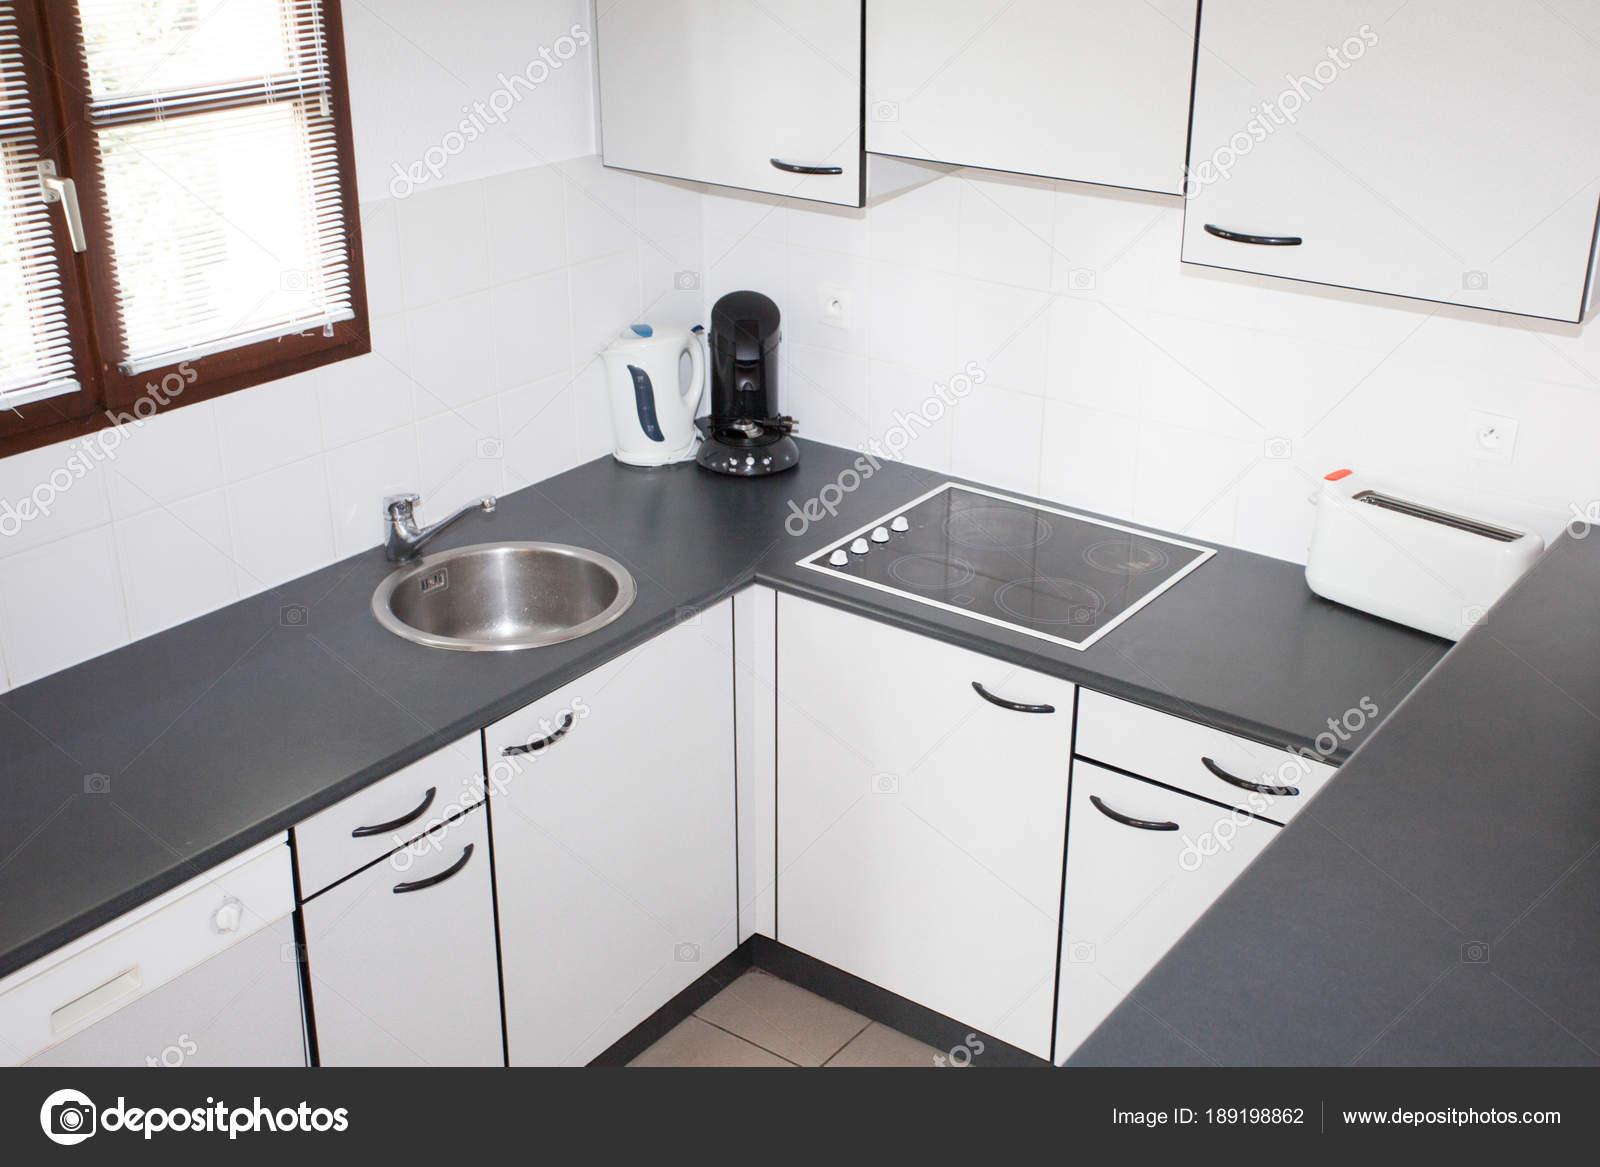 Moderne Keuken Grijs : Moderne keuken huis wit grijs u stockfoto sylv rob